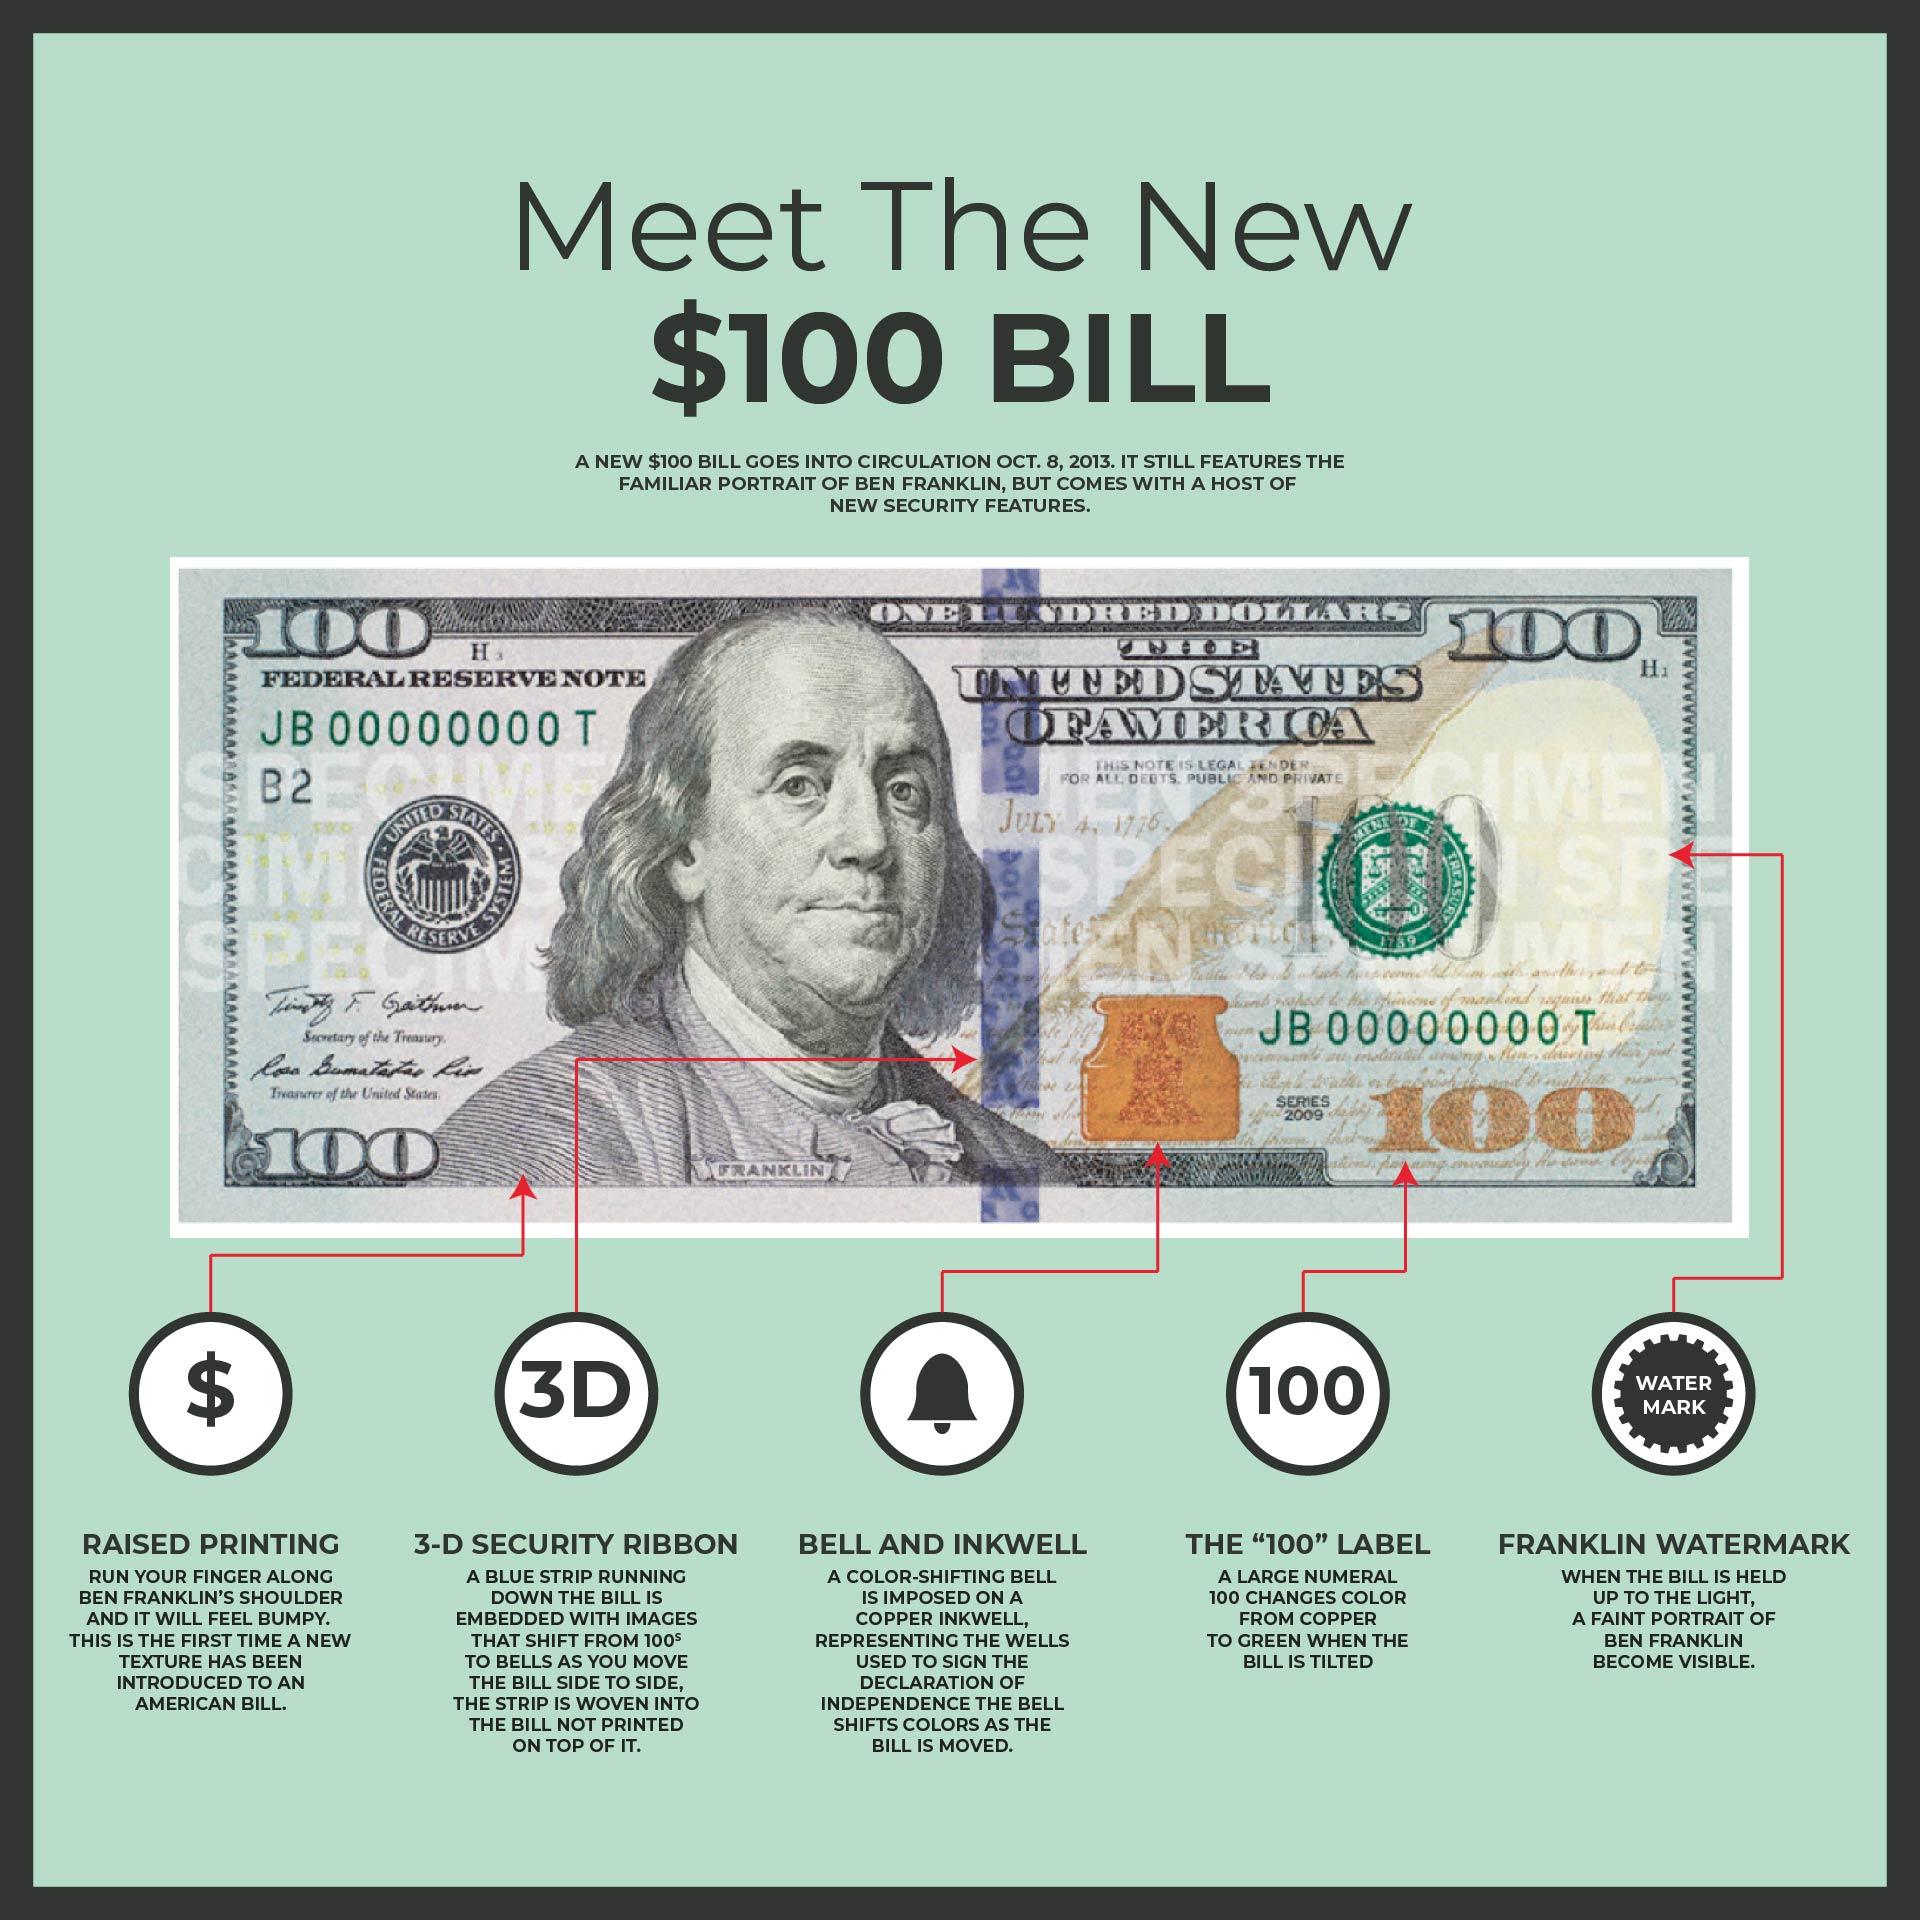 Real vs Counterfeit Money